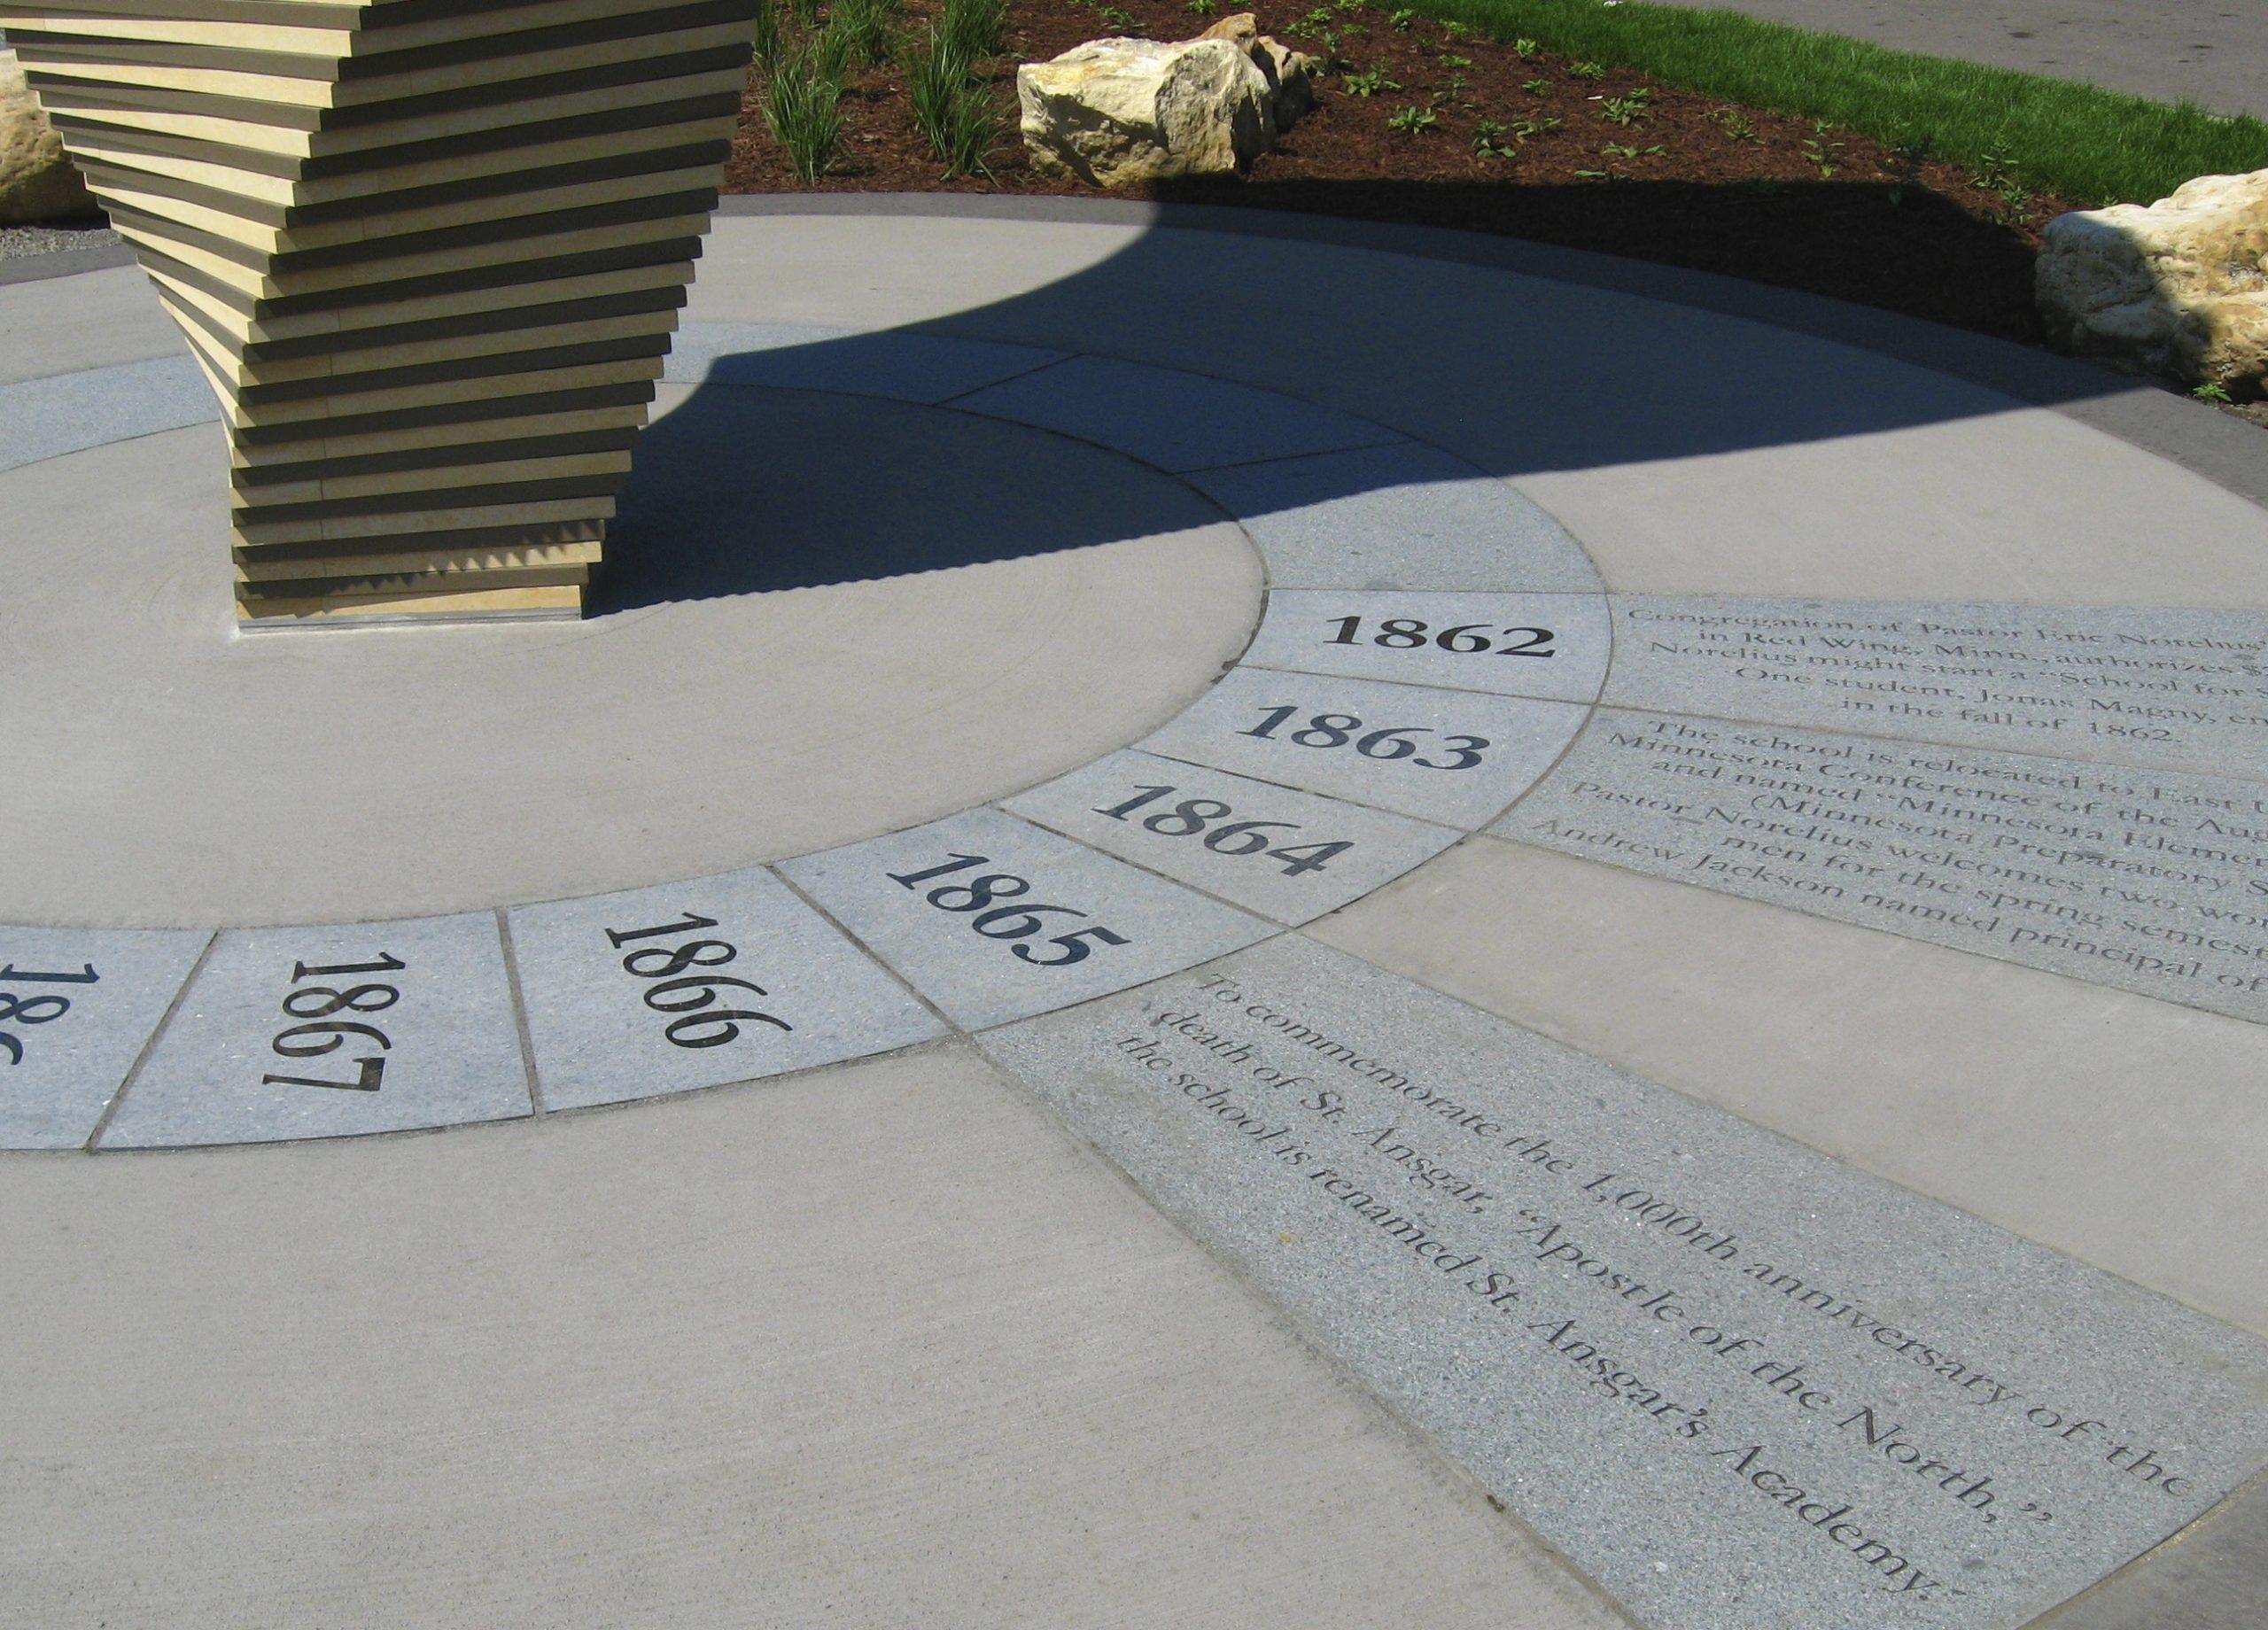 Sesquicentennial Sculpture and Plaza